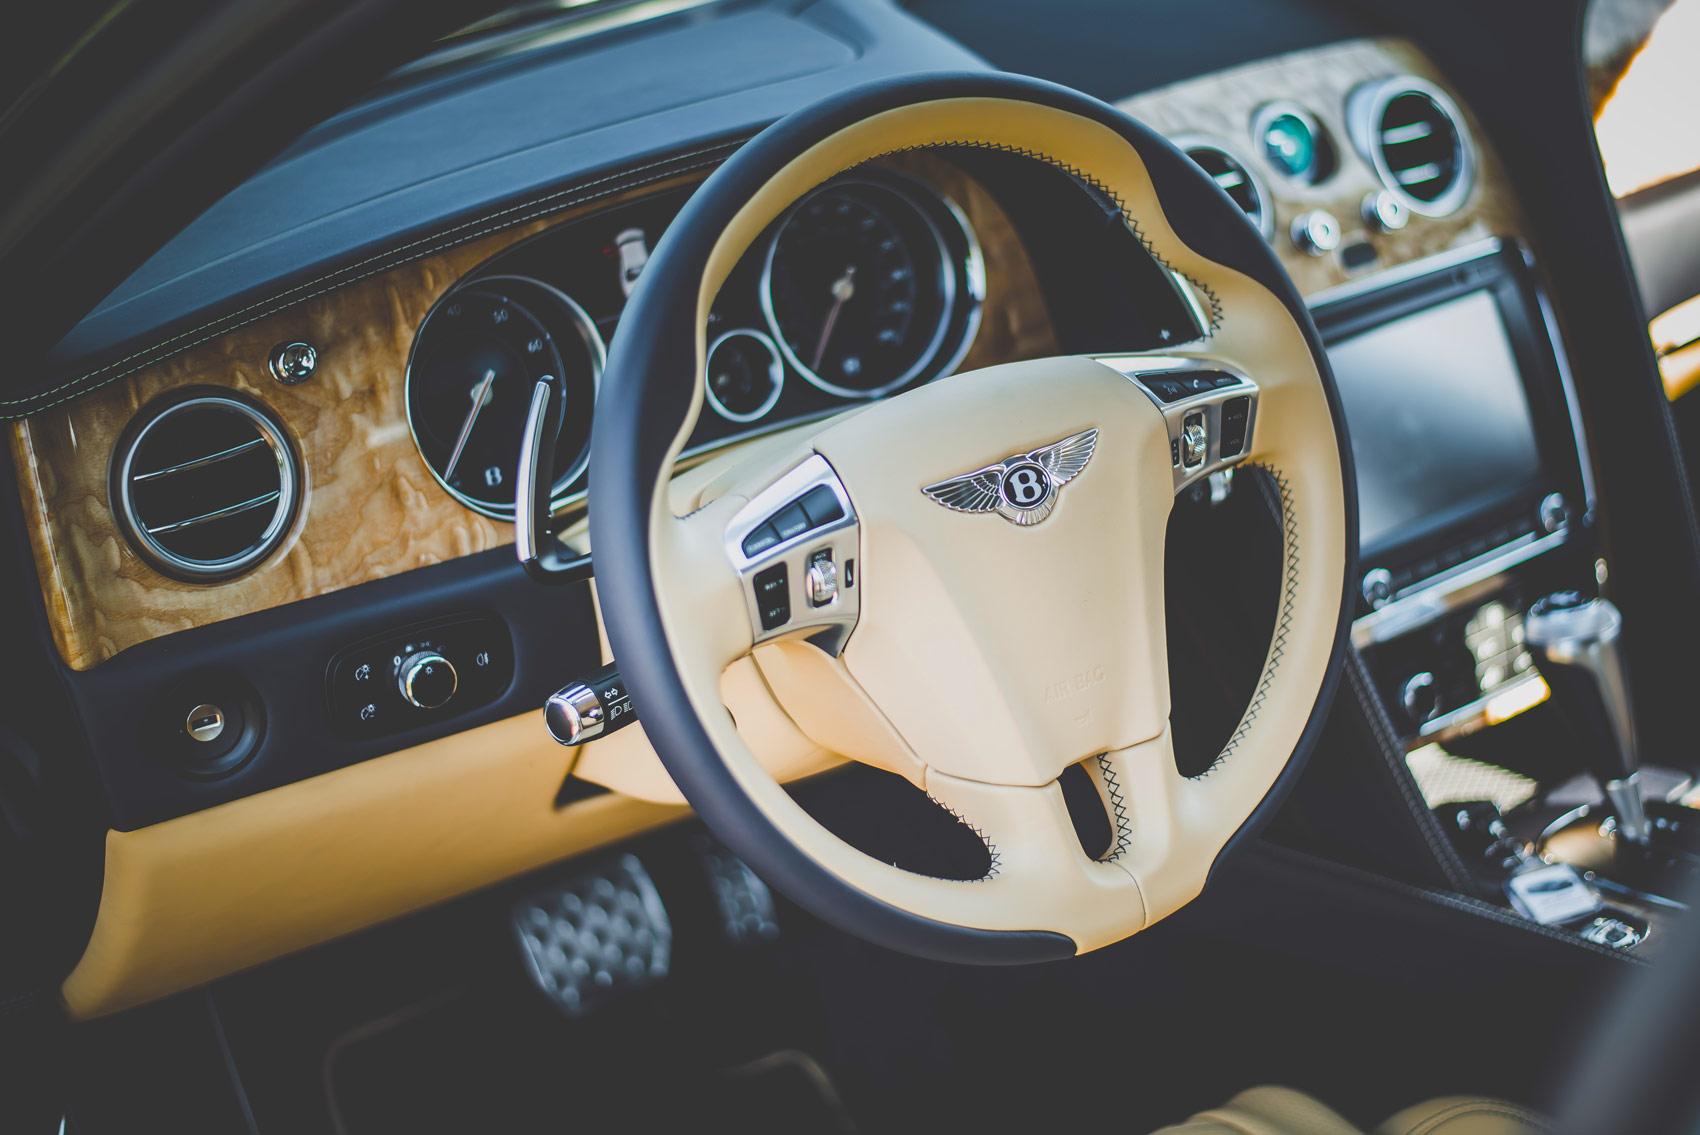 Beluga hand-stitched leather steering wheel